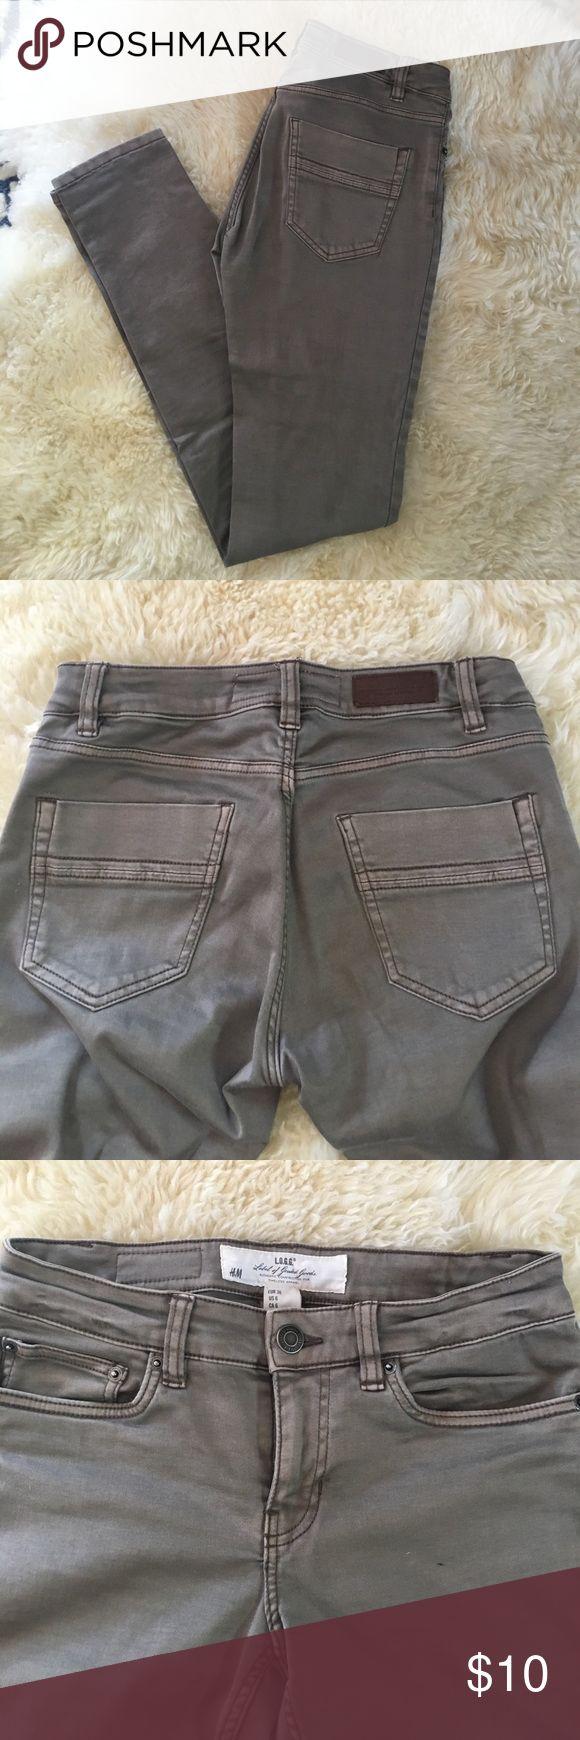 H&M skinny kaki jeans. Pre loved kaki jeans. Size 6z Small pen mark shown on third picture. H&M Pants Skinny